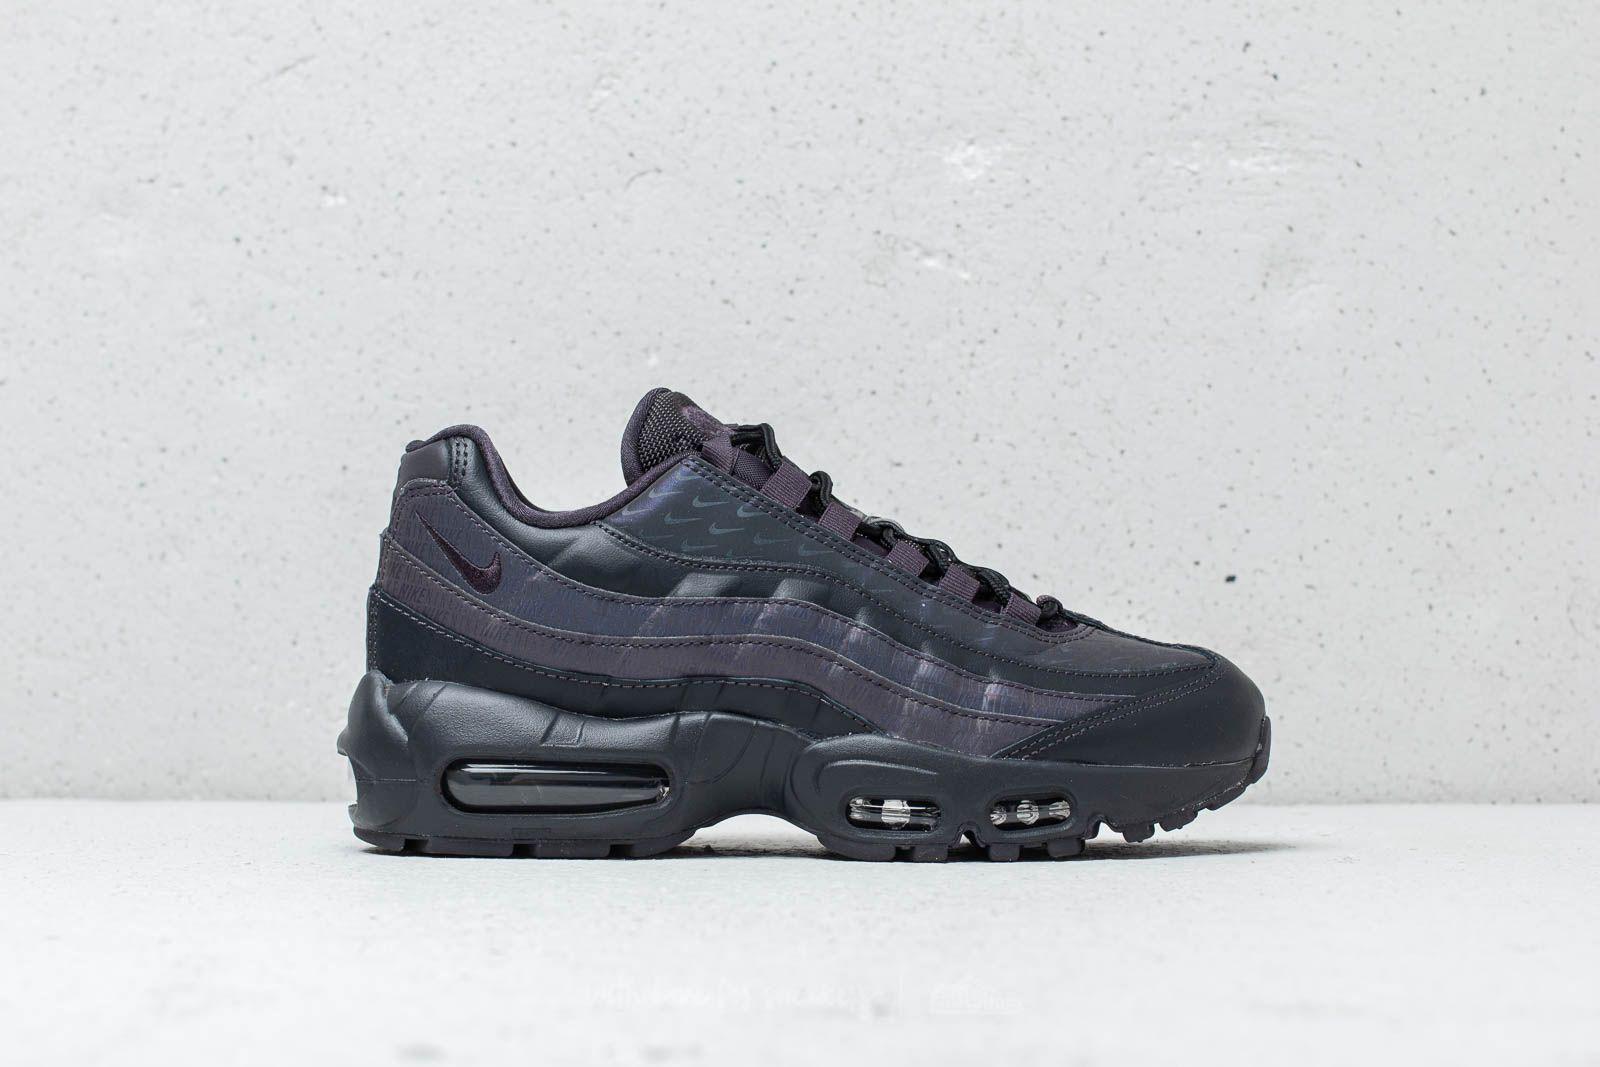 cad6e623c0c Nike - Gray Wmns Air Max 95 Lx Oil Grey  Oil Grey-oil Grey. View fullscreen